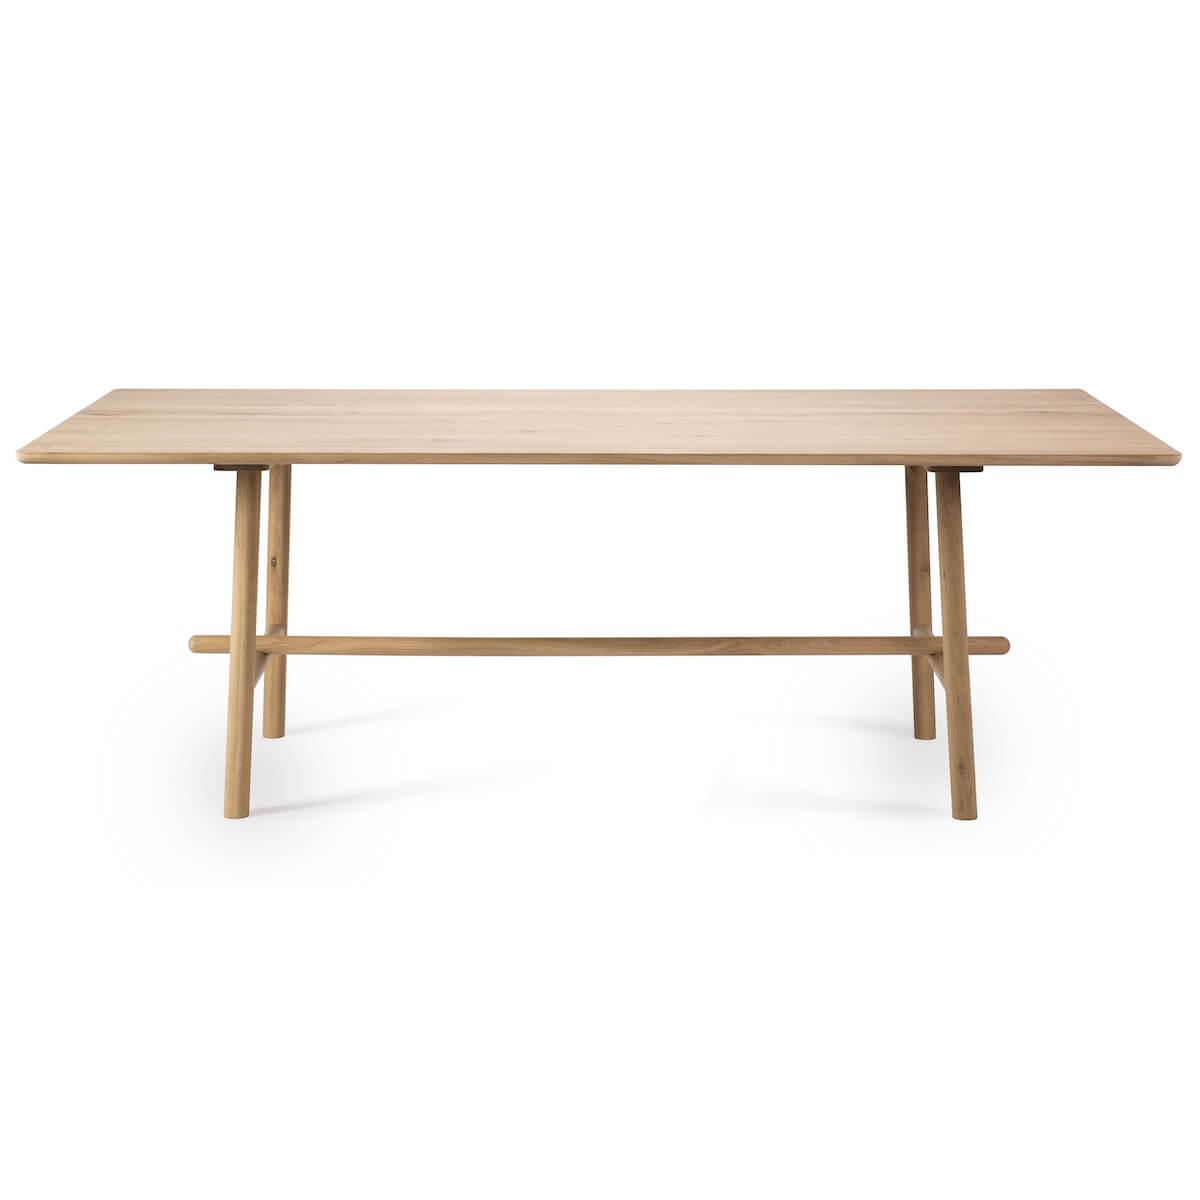 Table 100x220cm PROFILE Ethnicraft chêne